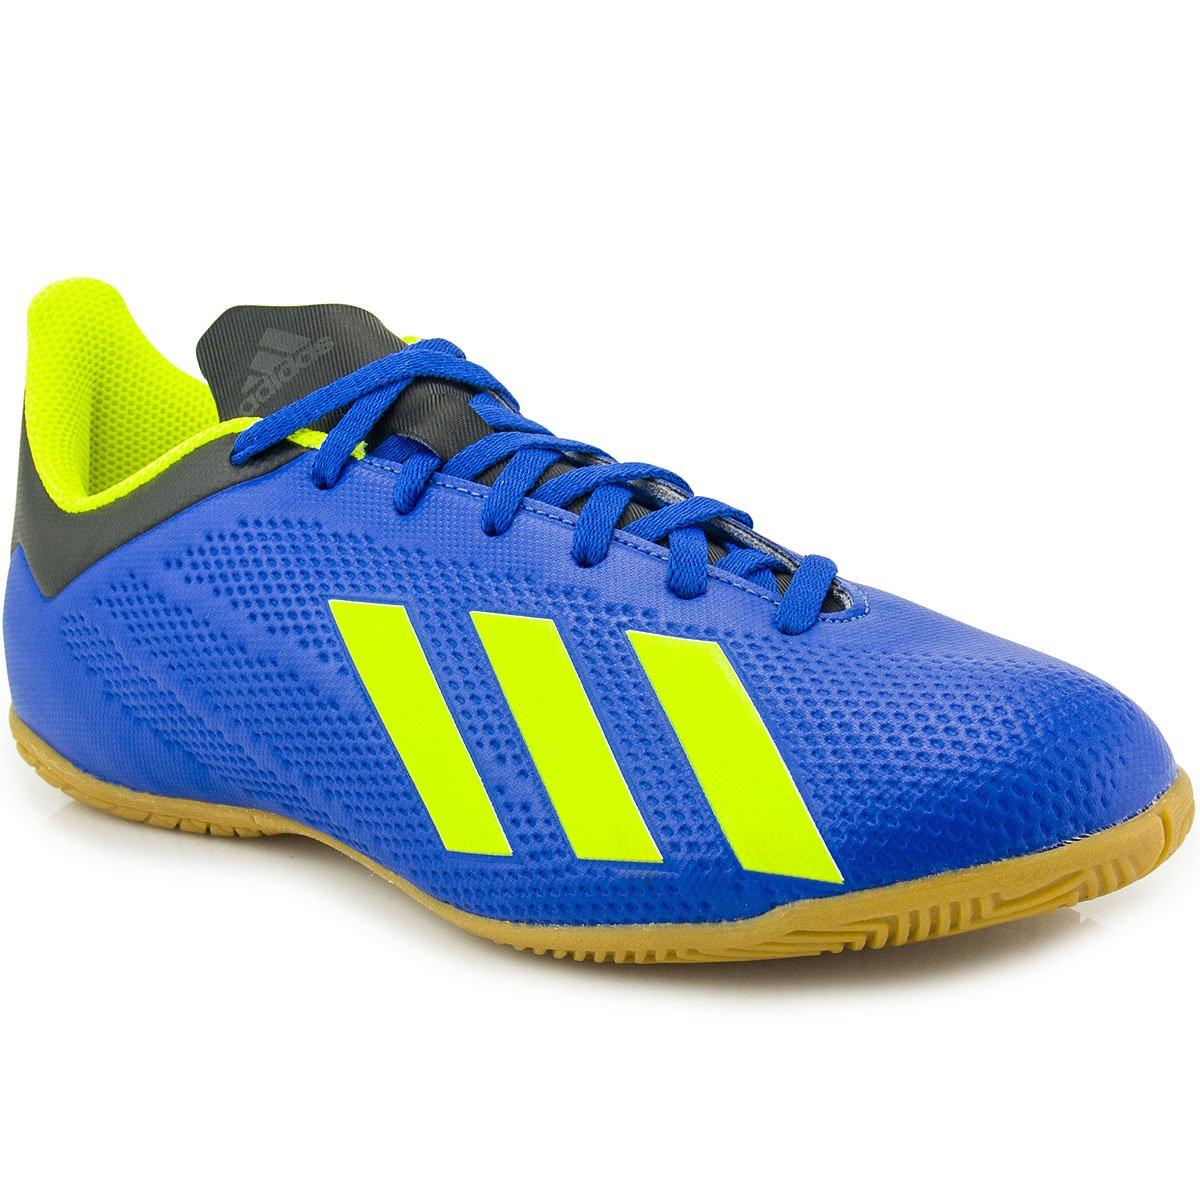 Chuteira Adidas X Tango 18.4 IN  551e0a2480b2a